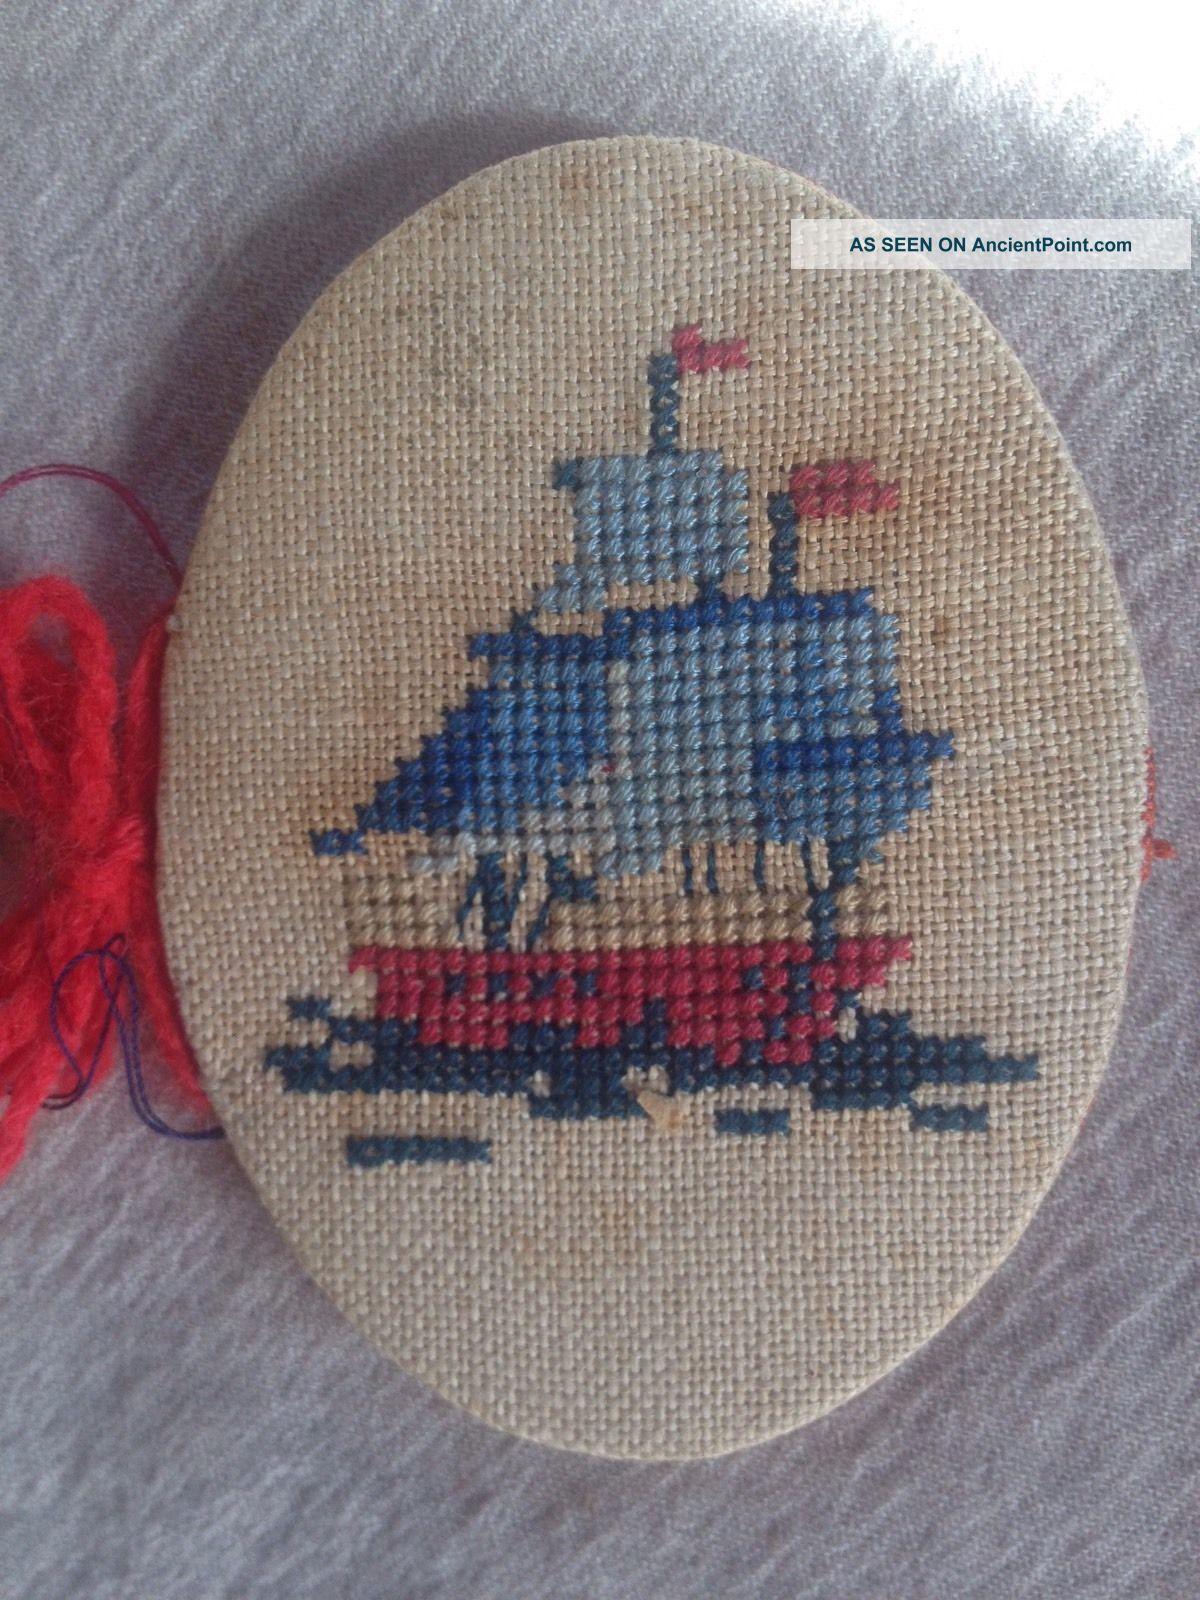 Antique Stitched Needle Case - Sailing Ship & Anchor Nautical Design Needles & Cases photo